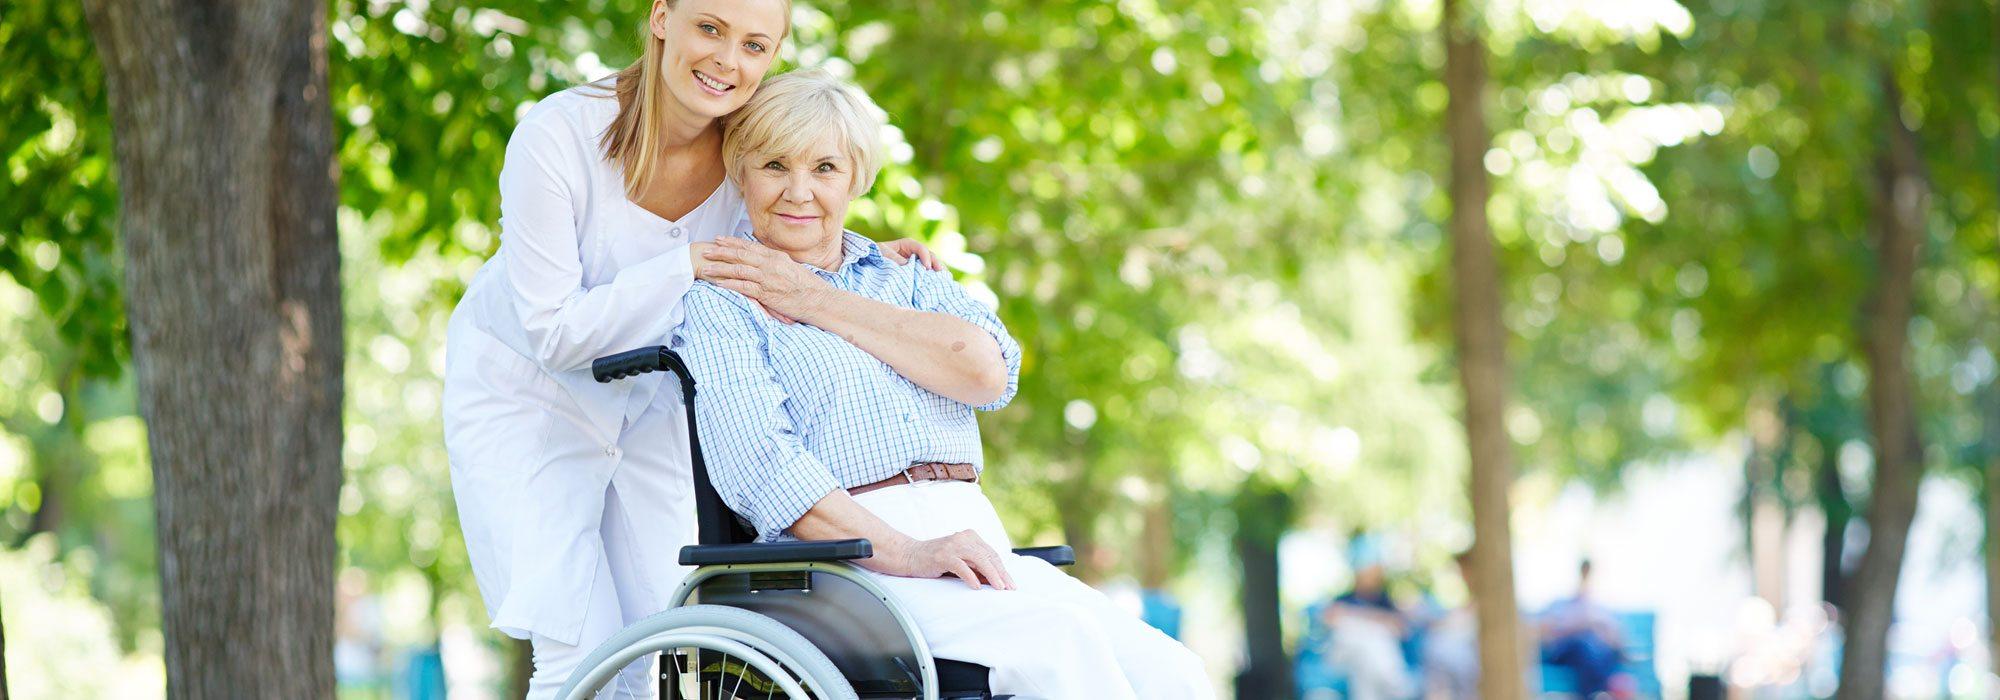 Aged Care Melbourne